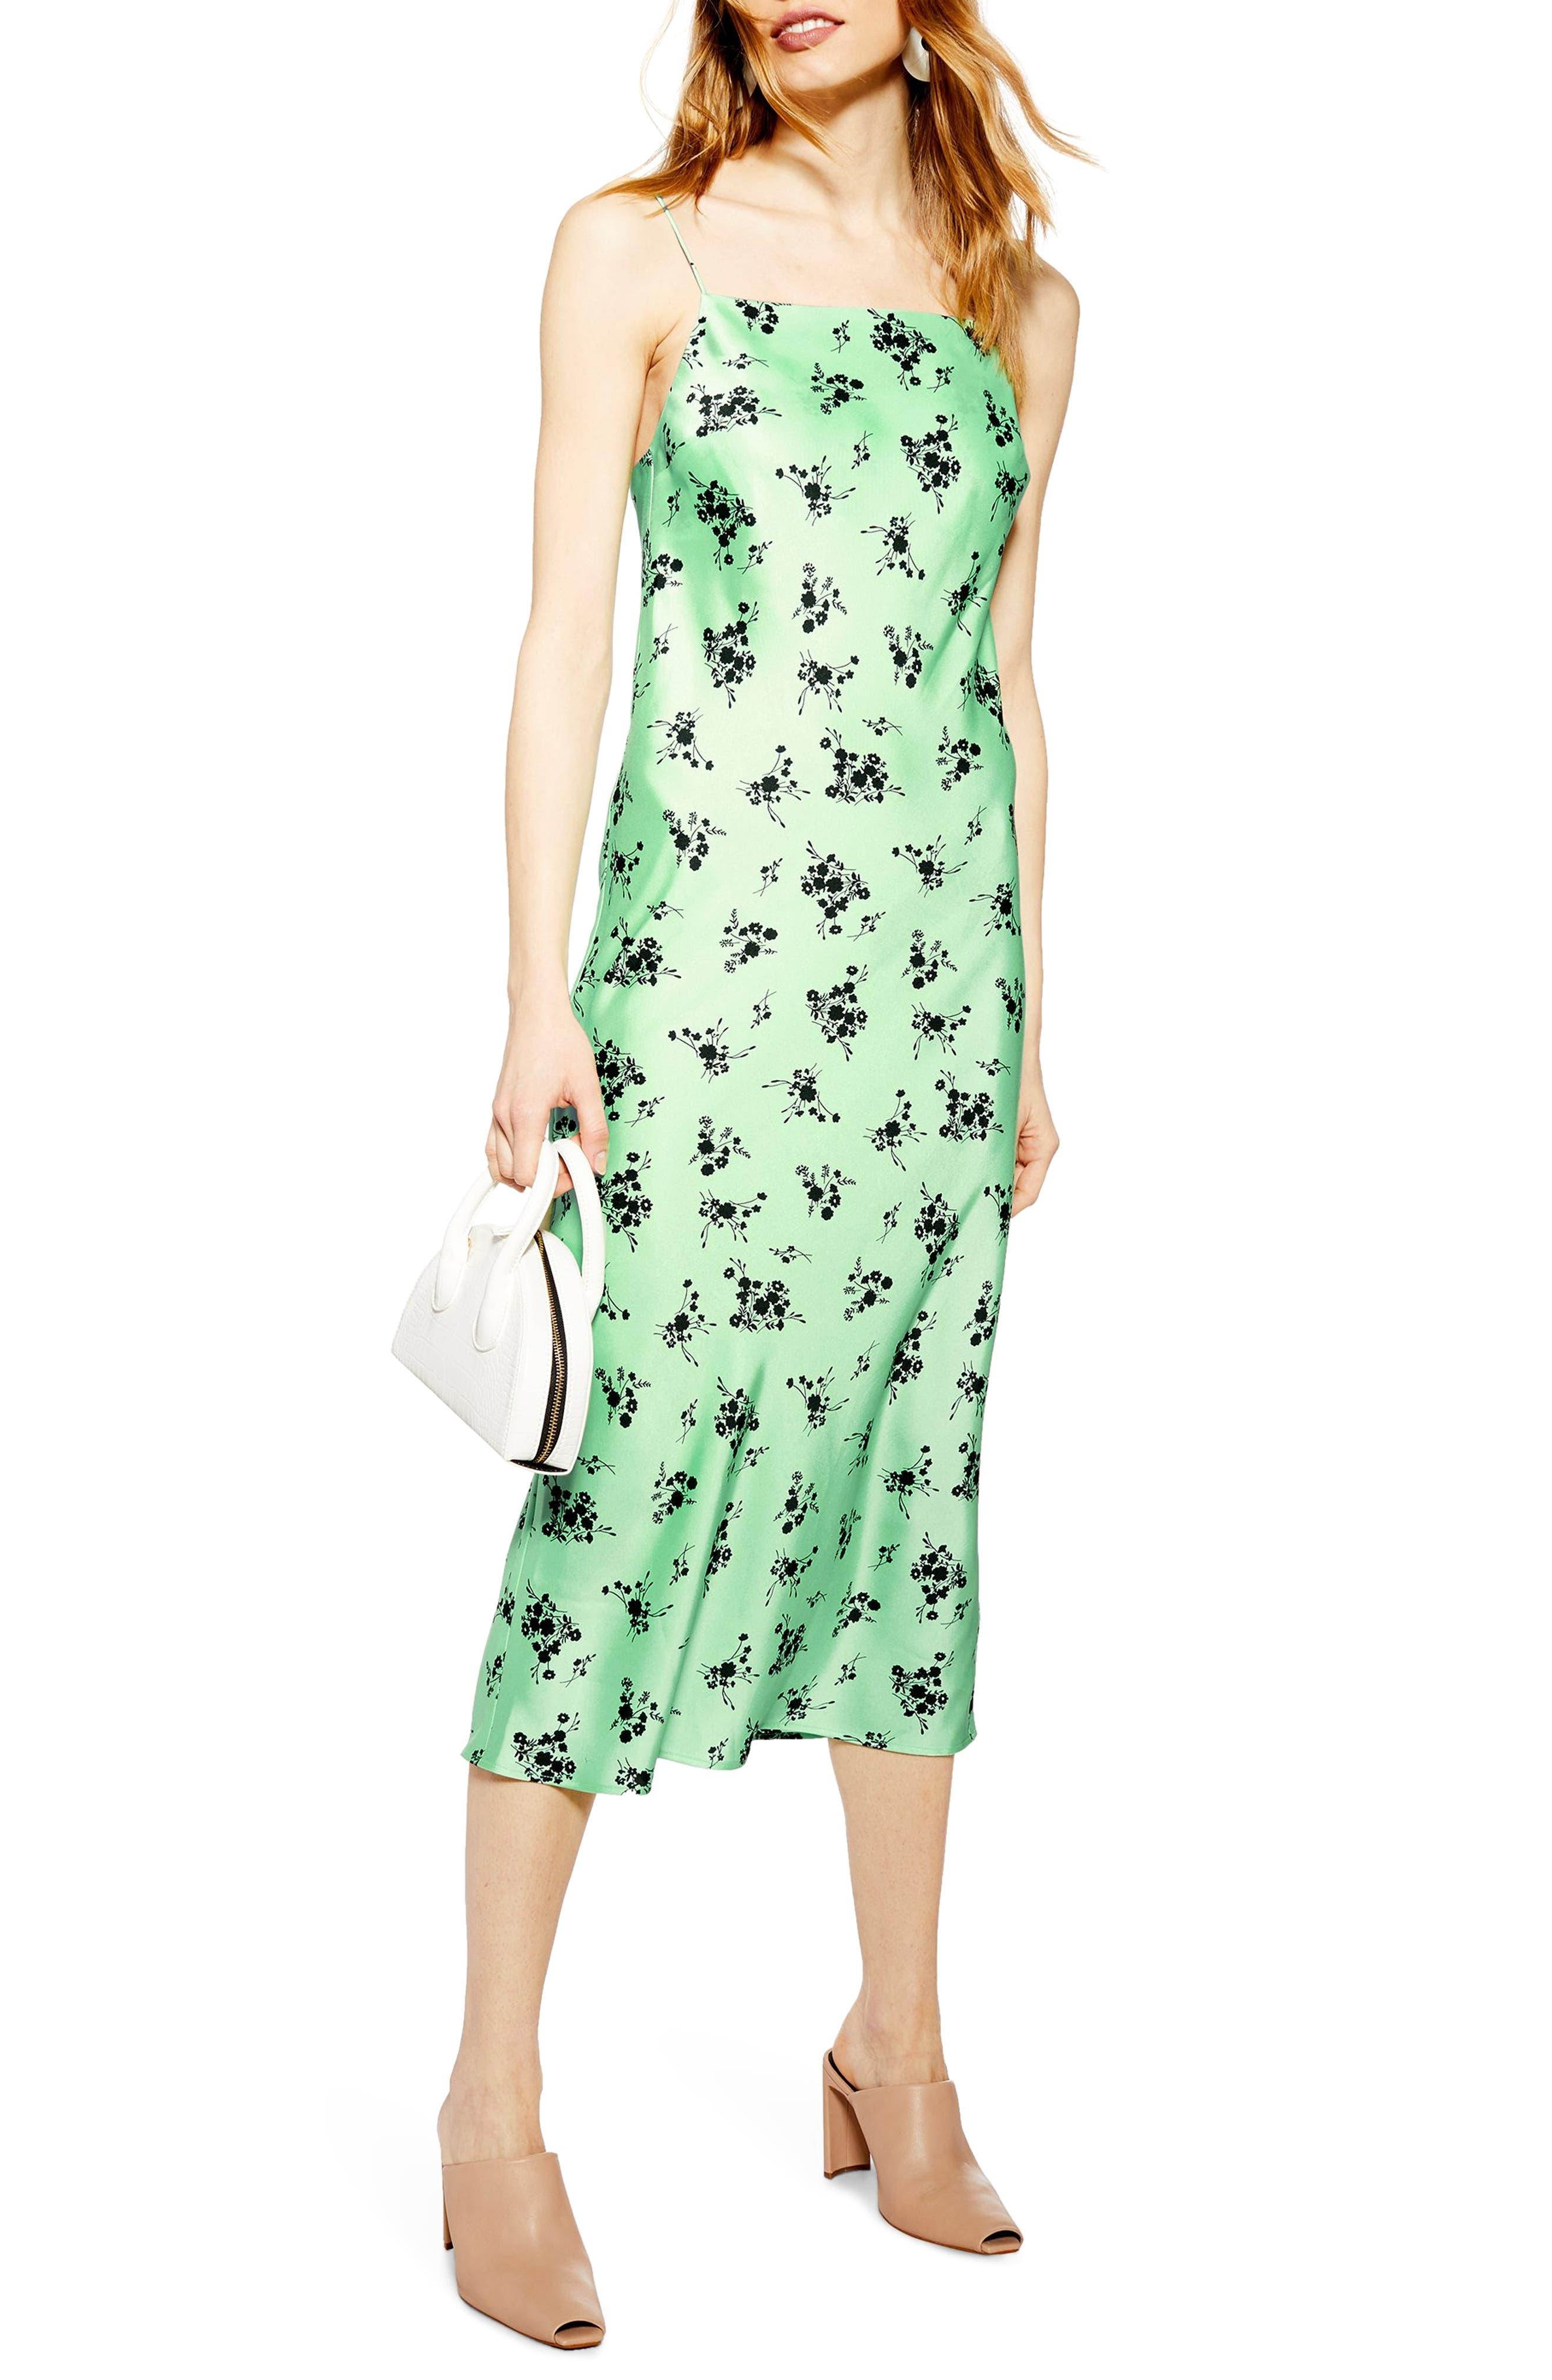 TOPSHOP, Apple Flower Satin Slip Dress, Main thumbnail 1, color, BRIGHT GREEN MULTI